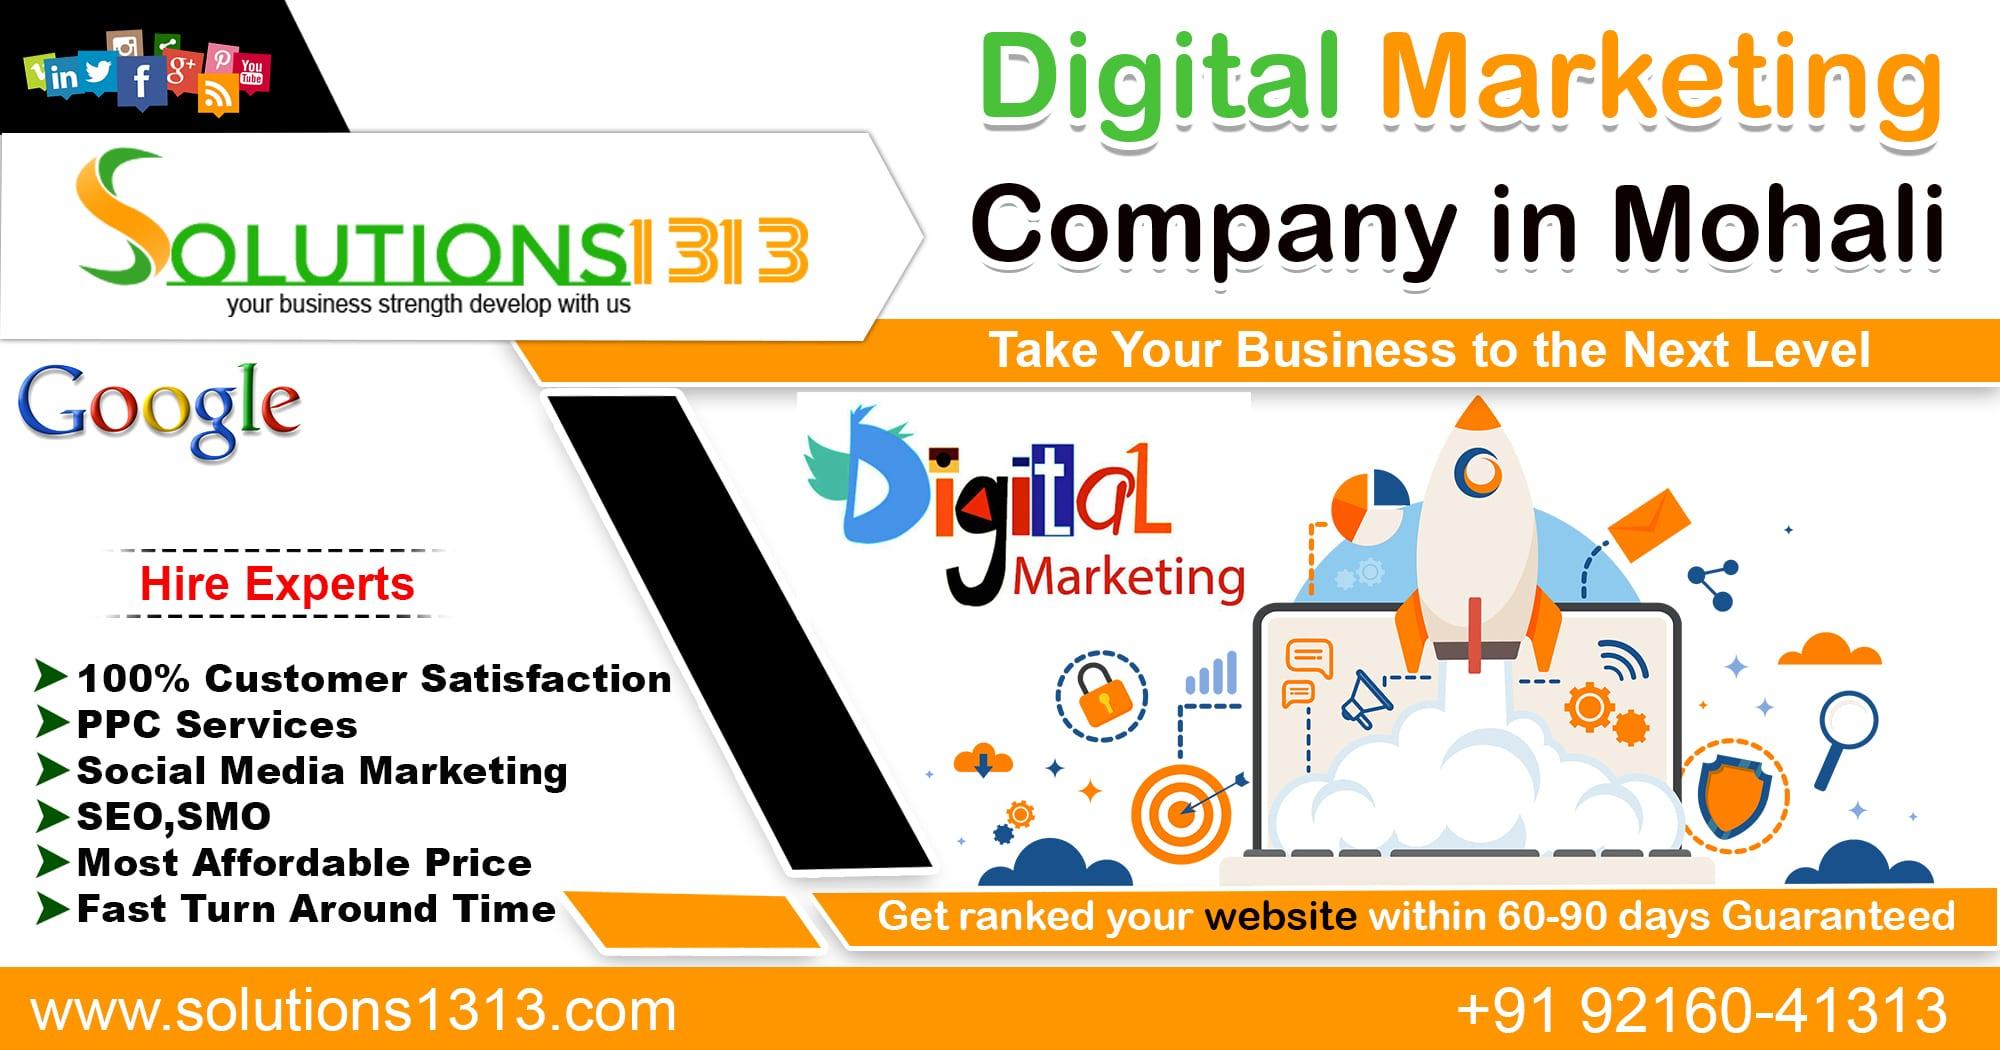 Digital Marketing Company in Mohali | Dial +91 9216041313